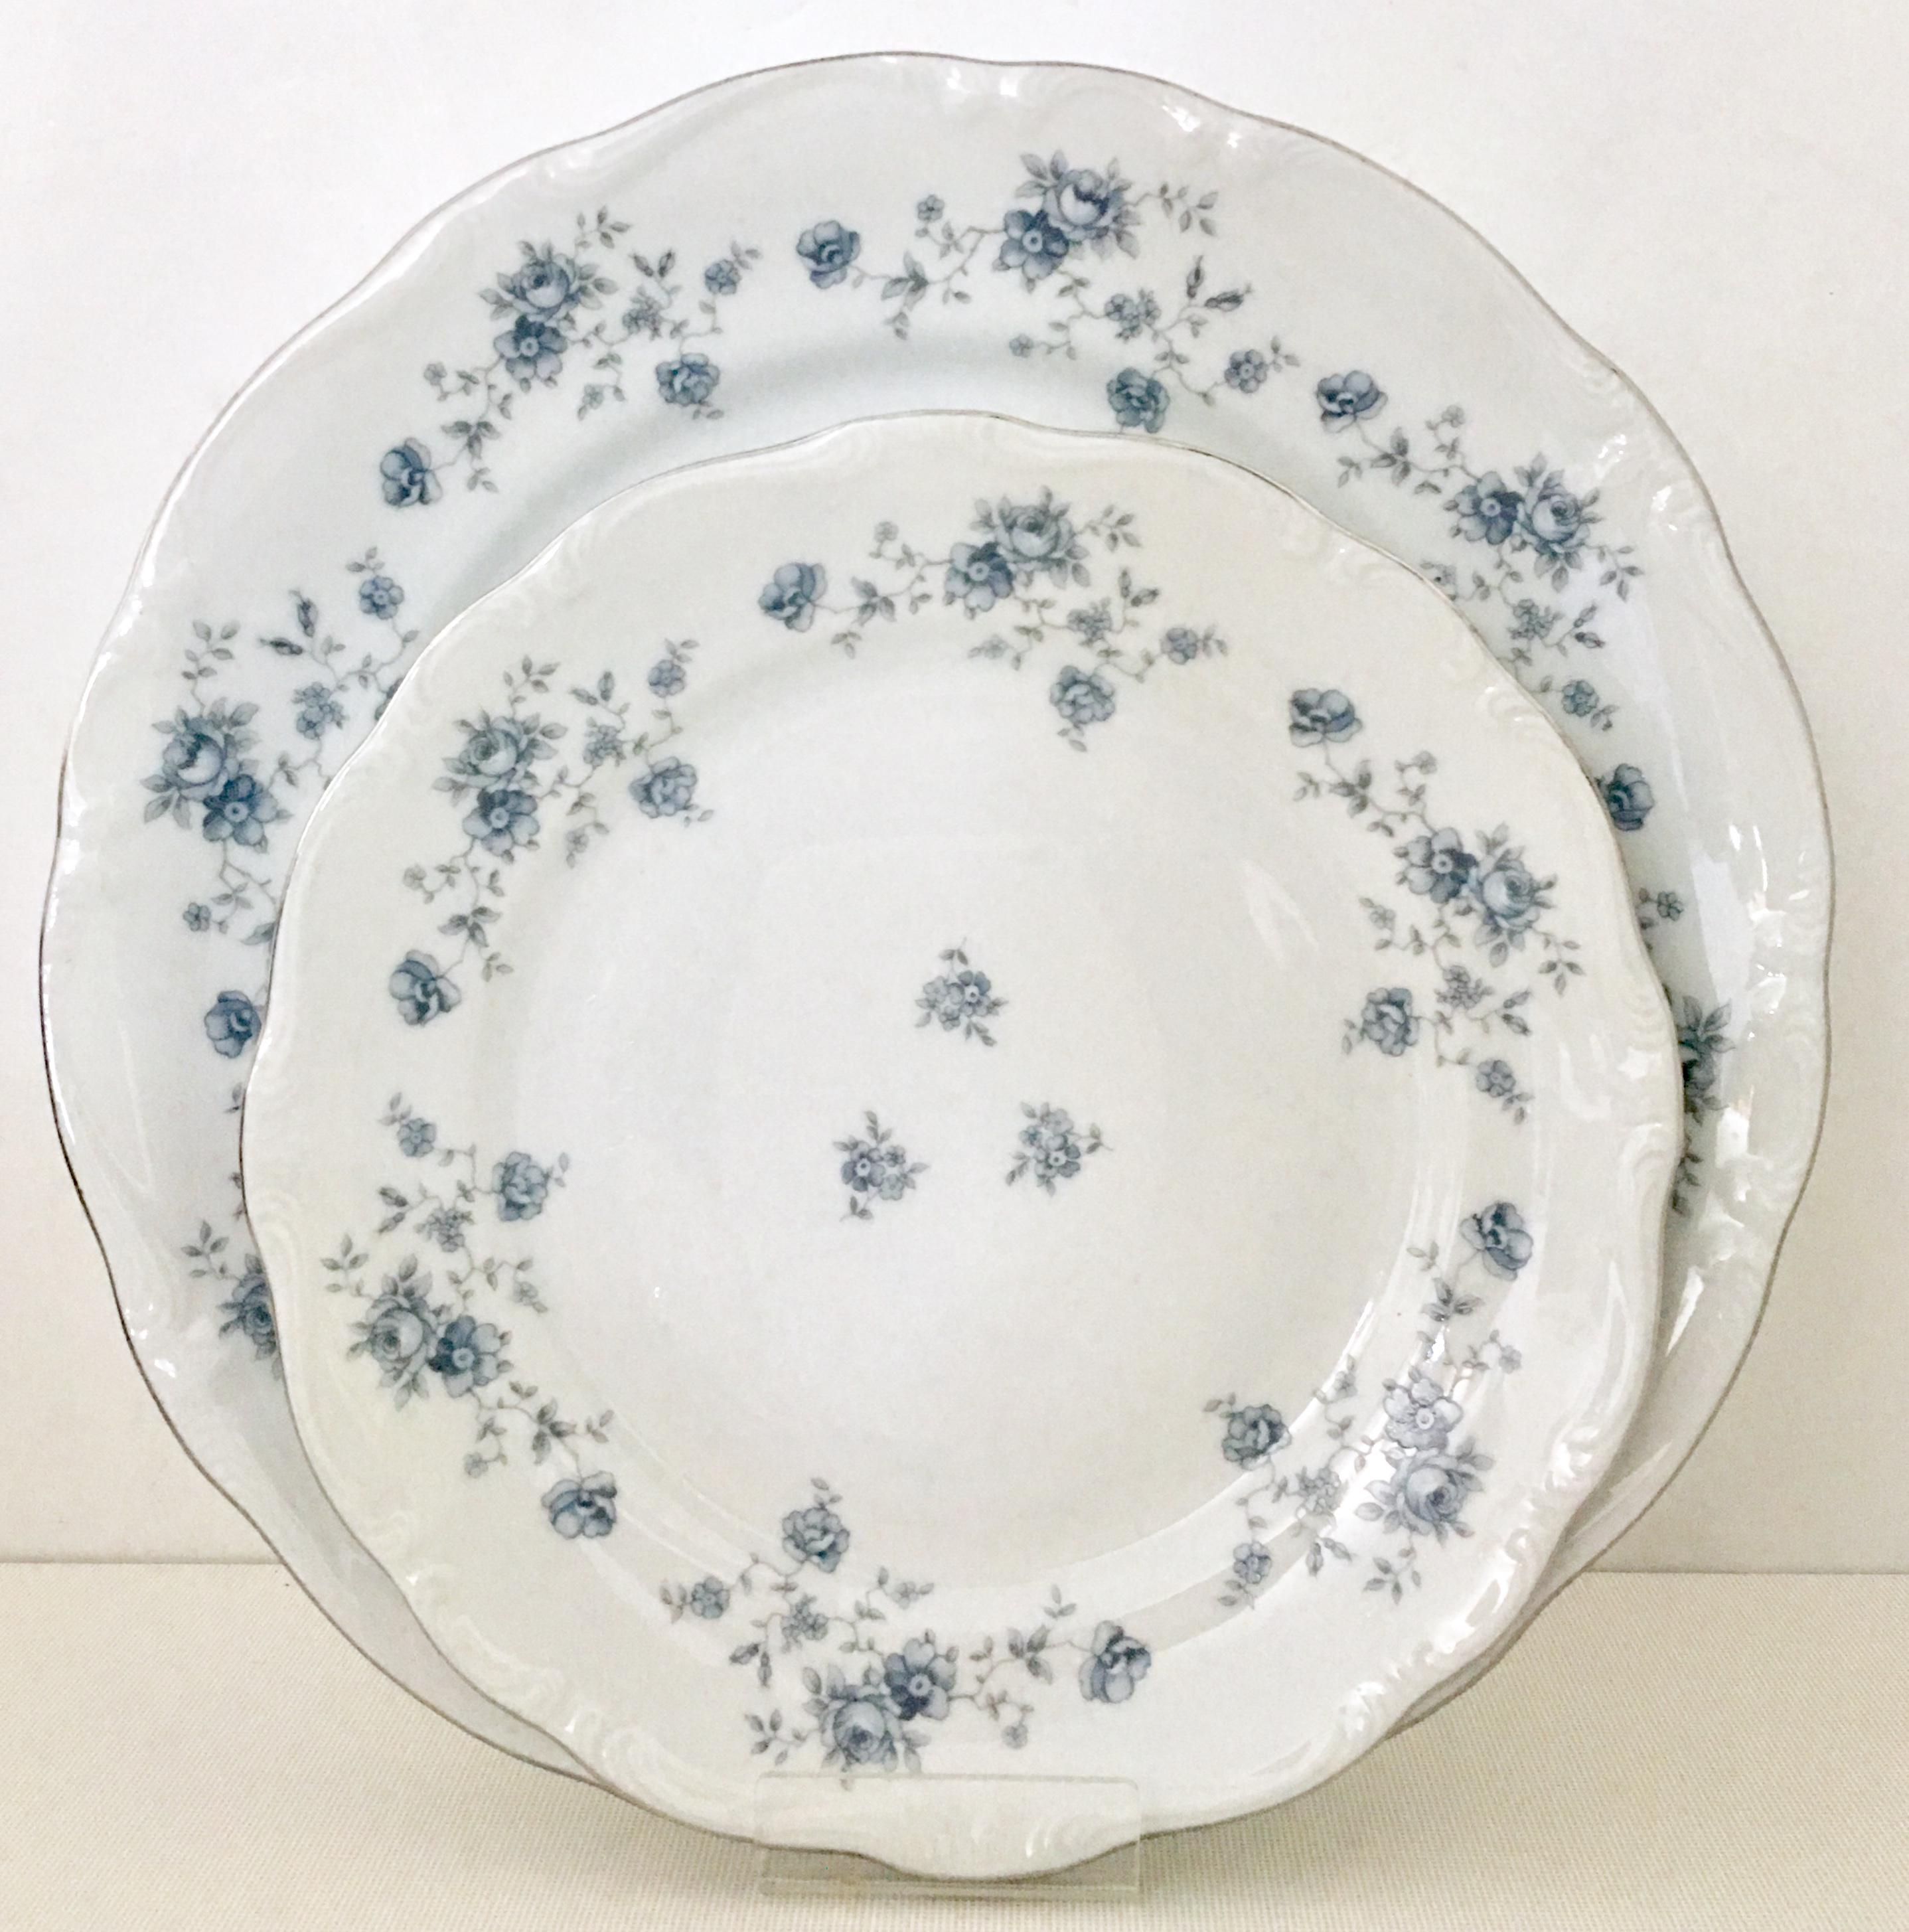 Johann Haviland German Porcelain \u0026 Platinum \ Blue Garland\  Dinnerware - Set of 30 -  sc 1 st  Chairish & Johann Haviland German Porcelain \u0026 Platinum \